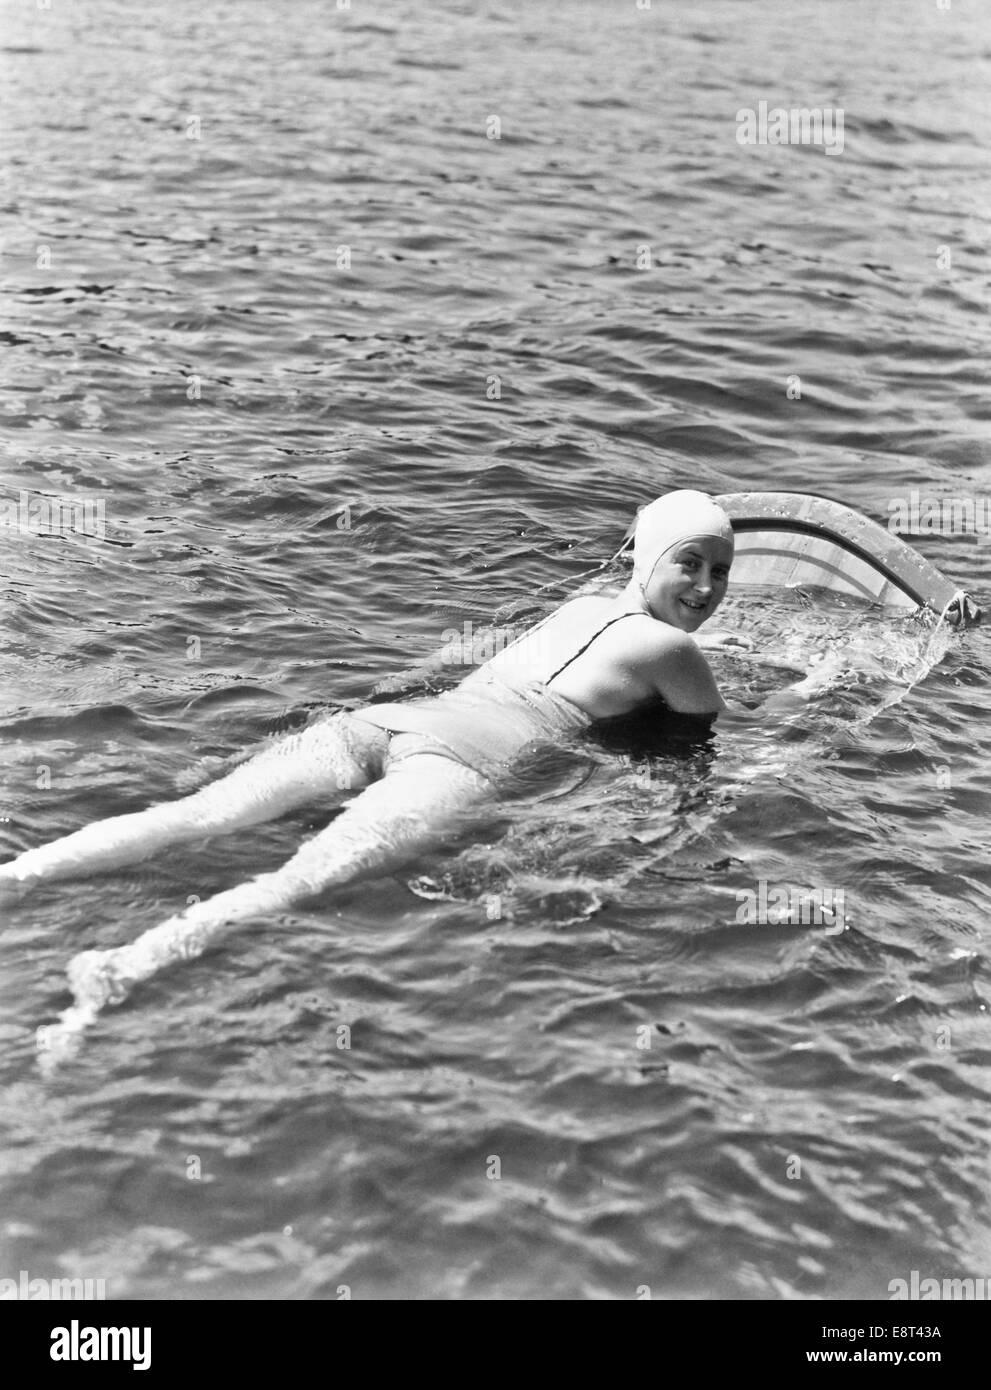 be972816c417e 1930s 1940s WOMAN WEAR BATHING CAP ONE PIECE SUIT LYING ON AQUA SKI BOARD  LOOK AT